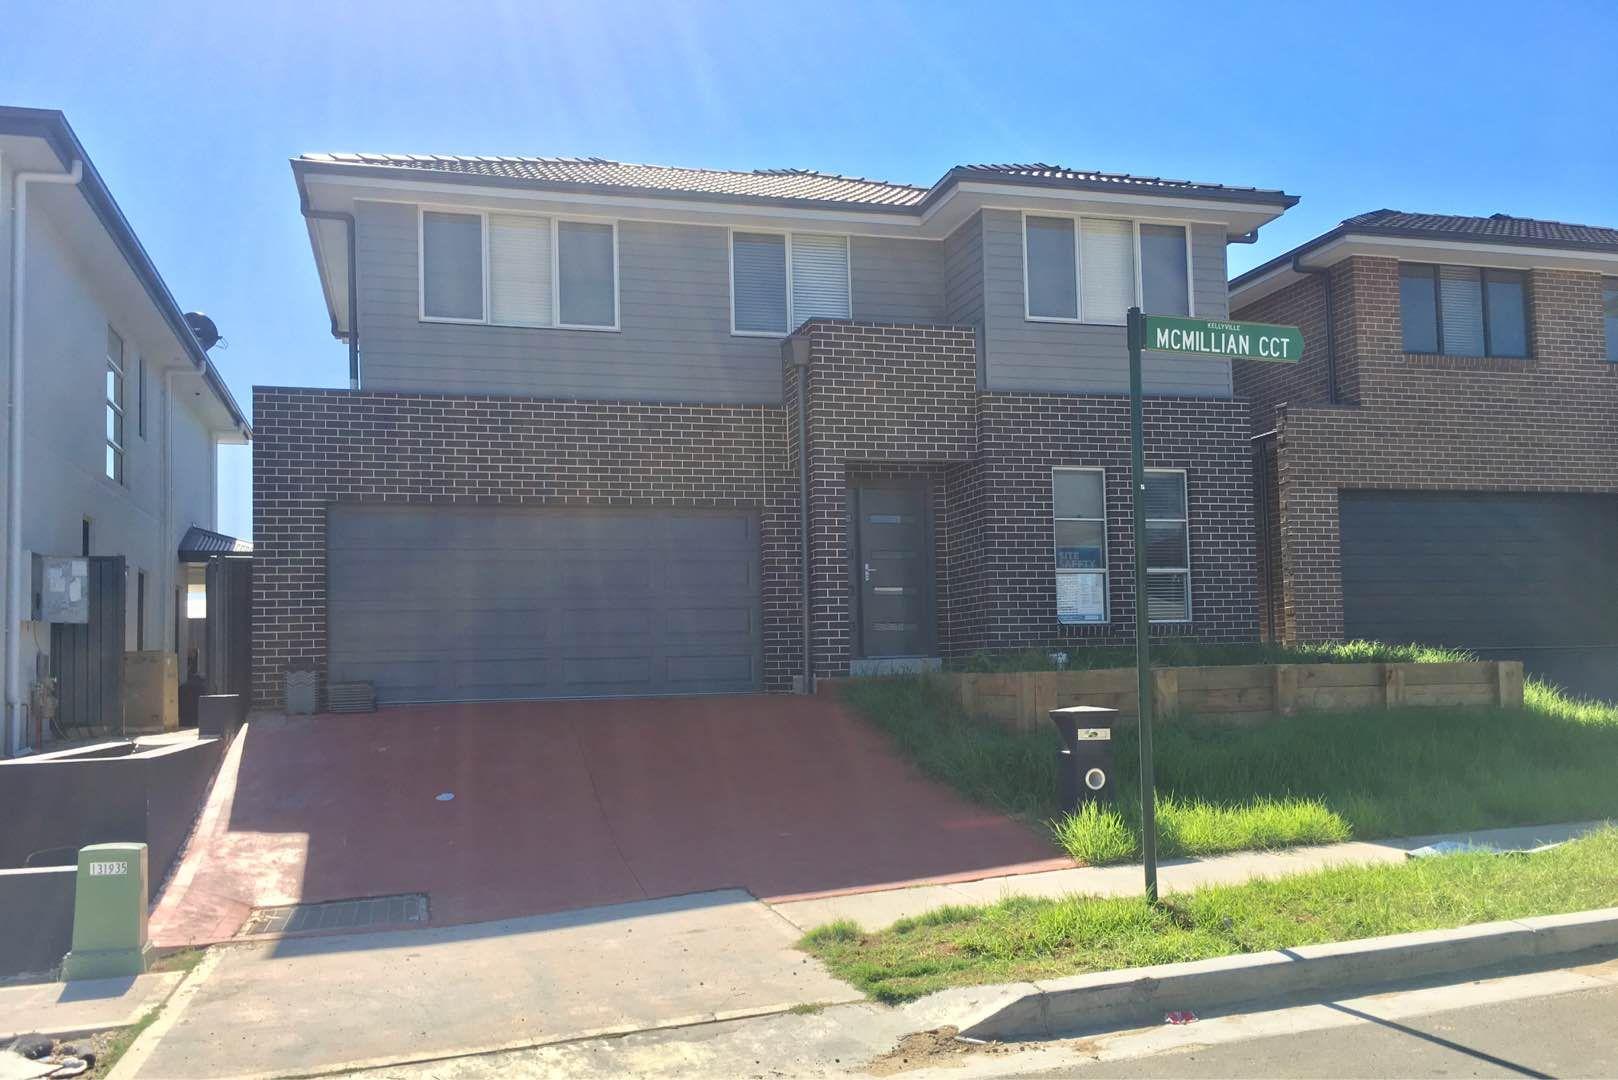 Lot 128/92 McMillian Cct, Kellyville NSW 2155, Image 0